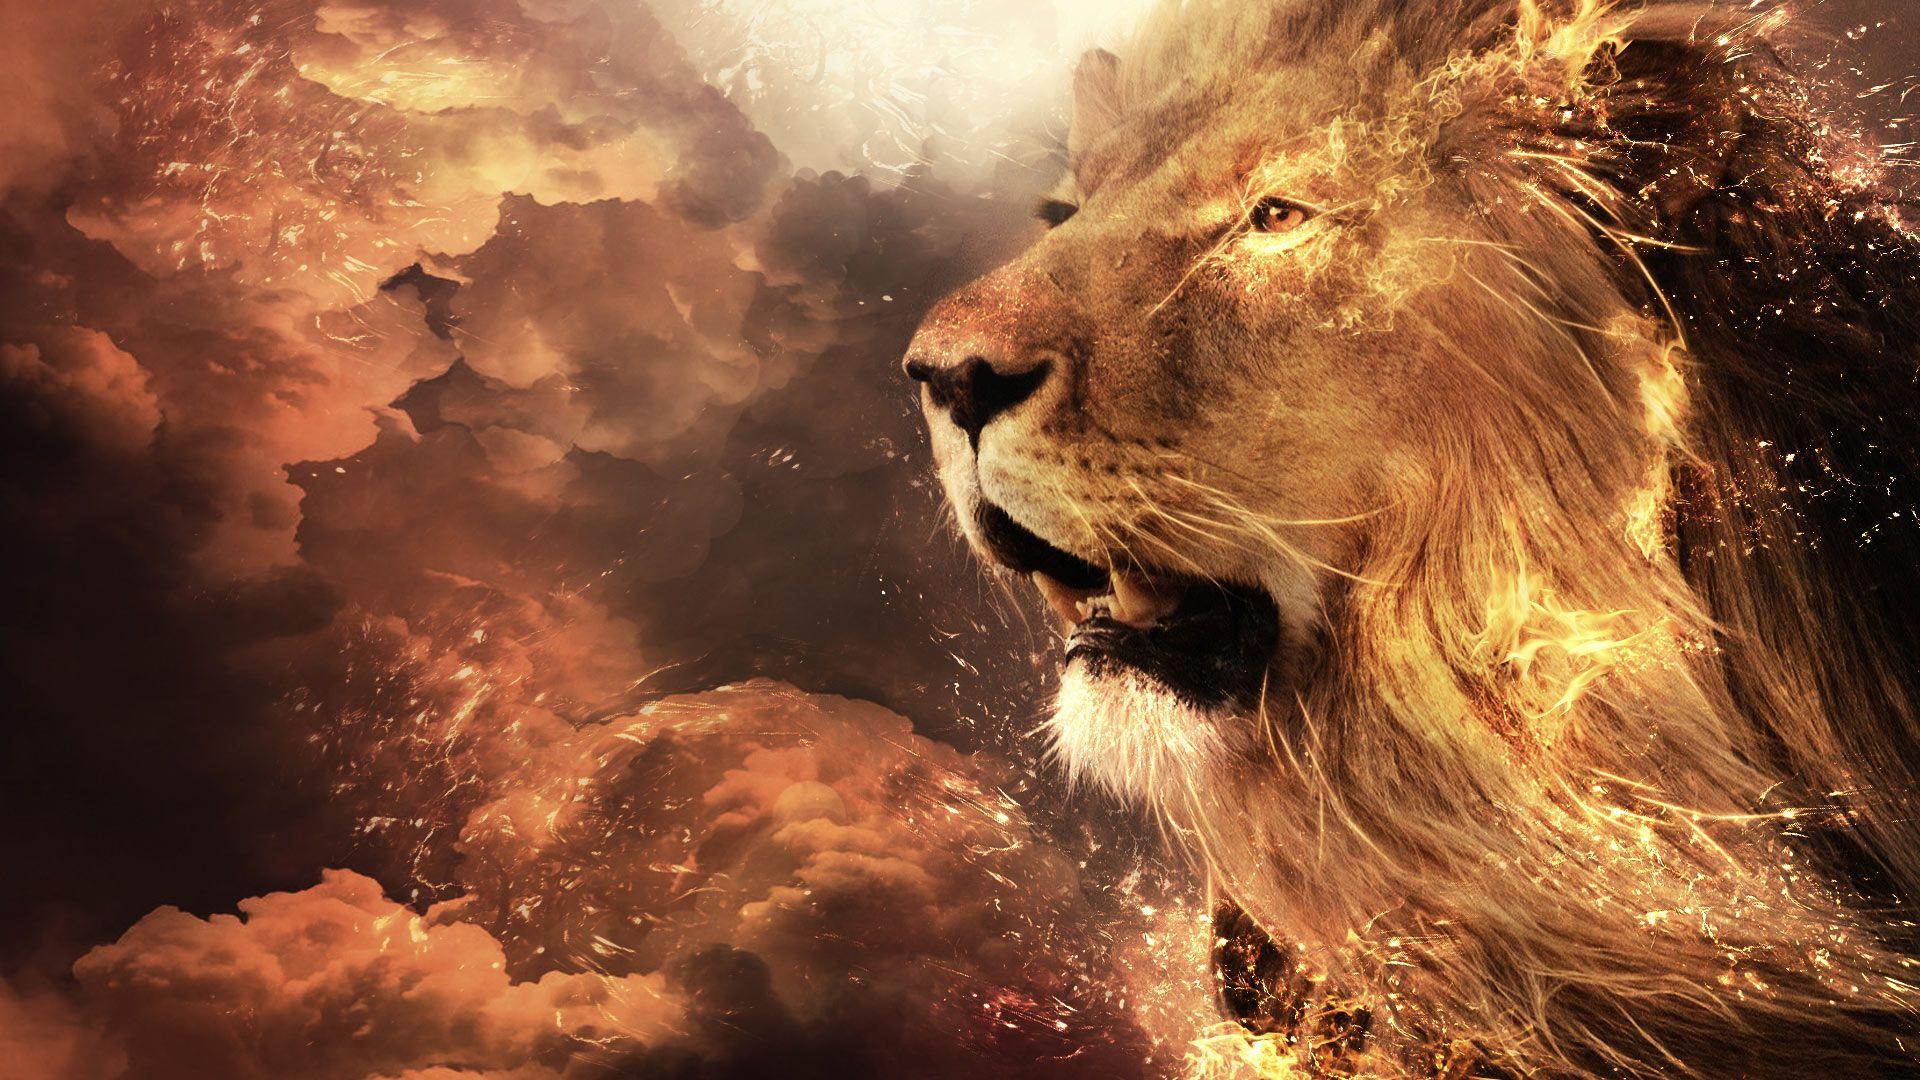 Lion Art wallpaper photo hd